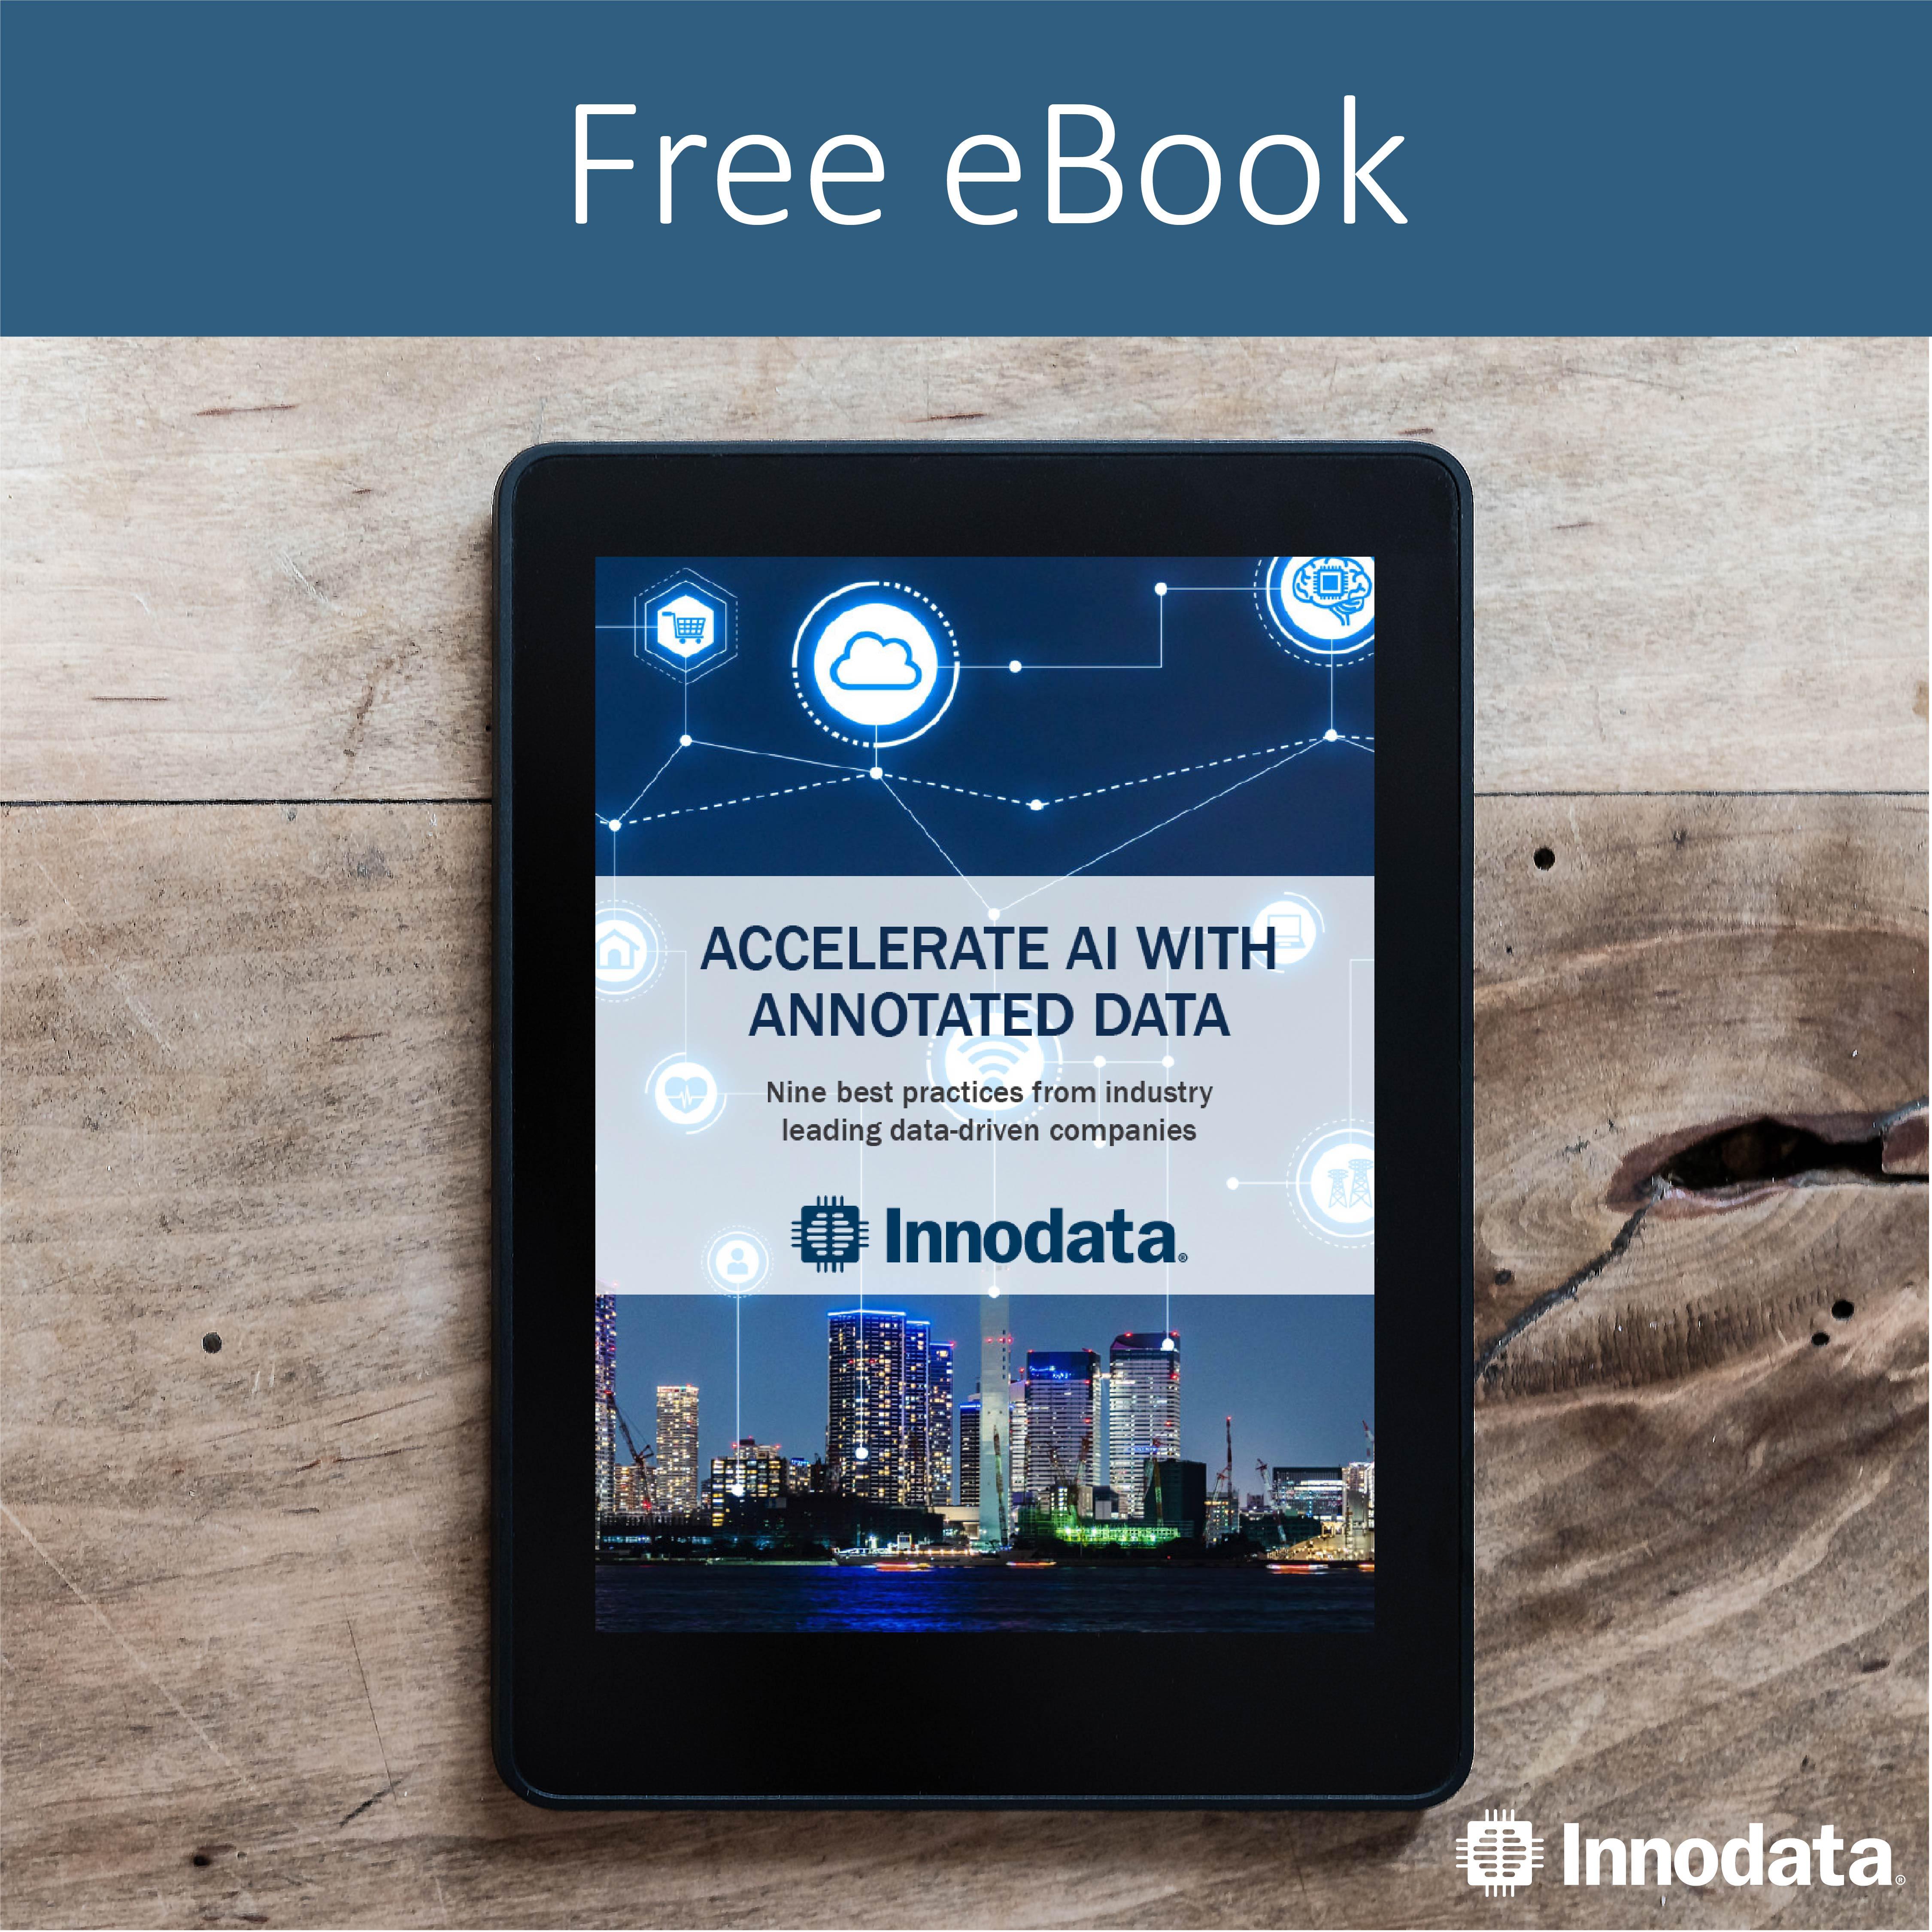 ebook_Ad_ebook 1st pg